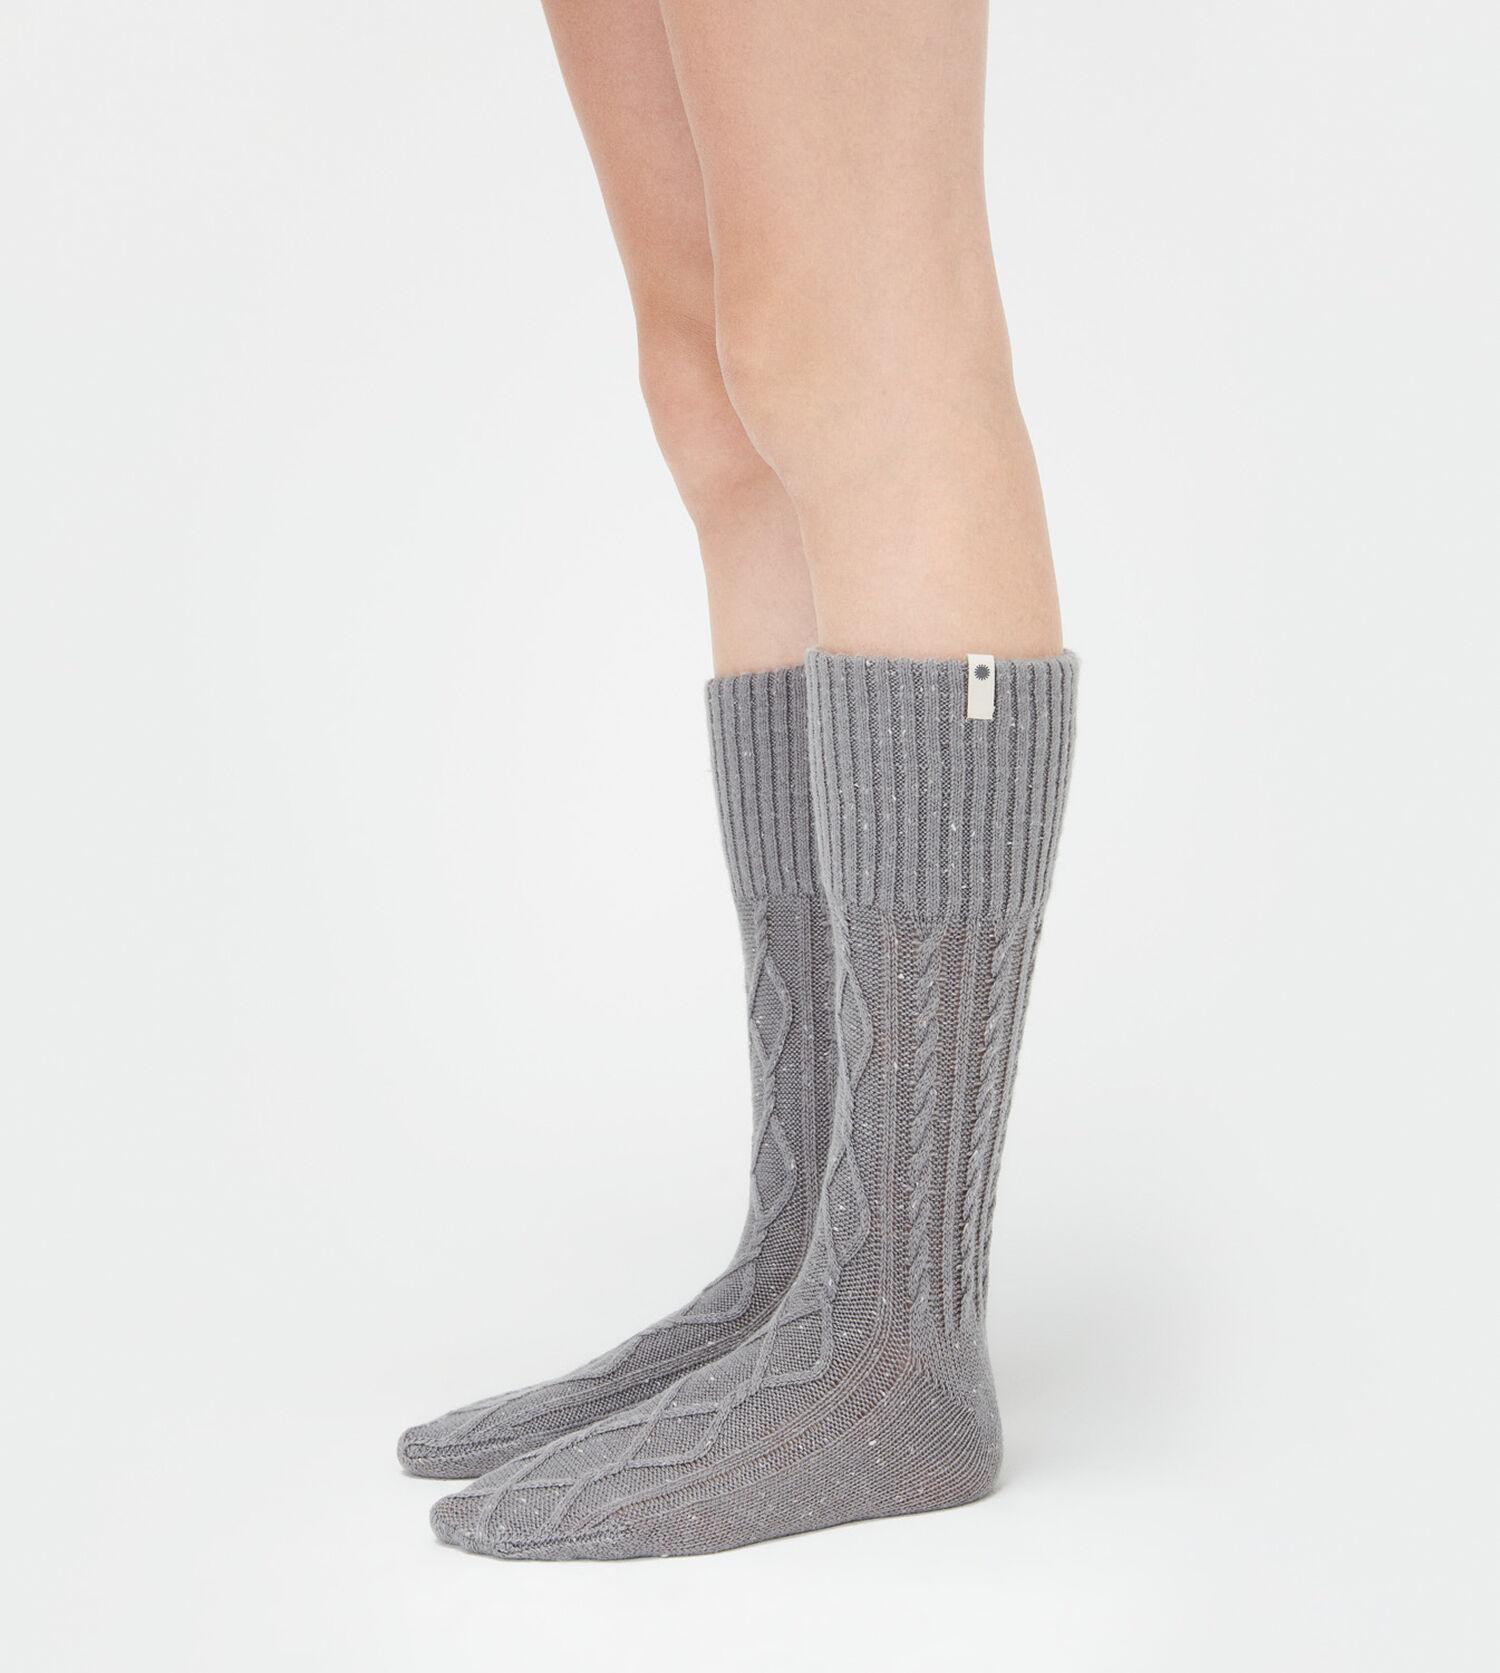 Ugg 174 Official Women S Sienna Short Rain Boot Sock Ugg Com